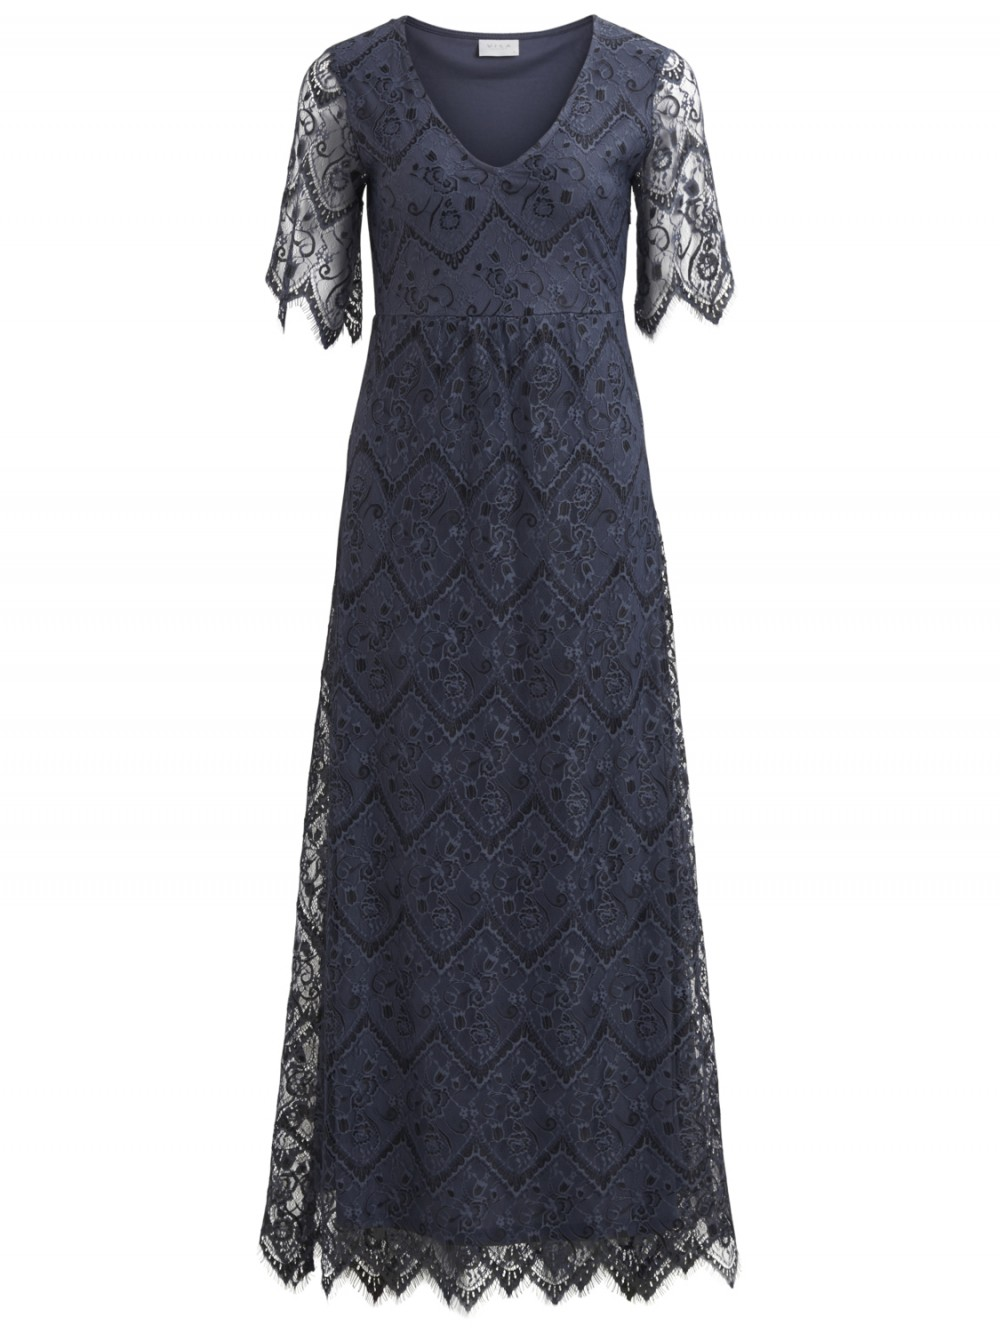 a2f0bc5ab Vila lang kjole, maxikjole med blonder, selskapskjole